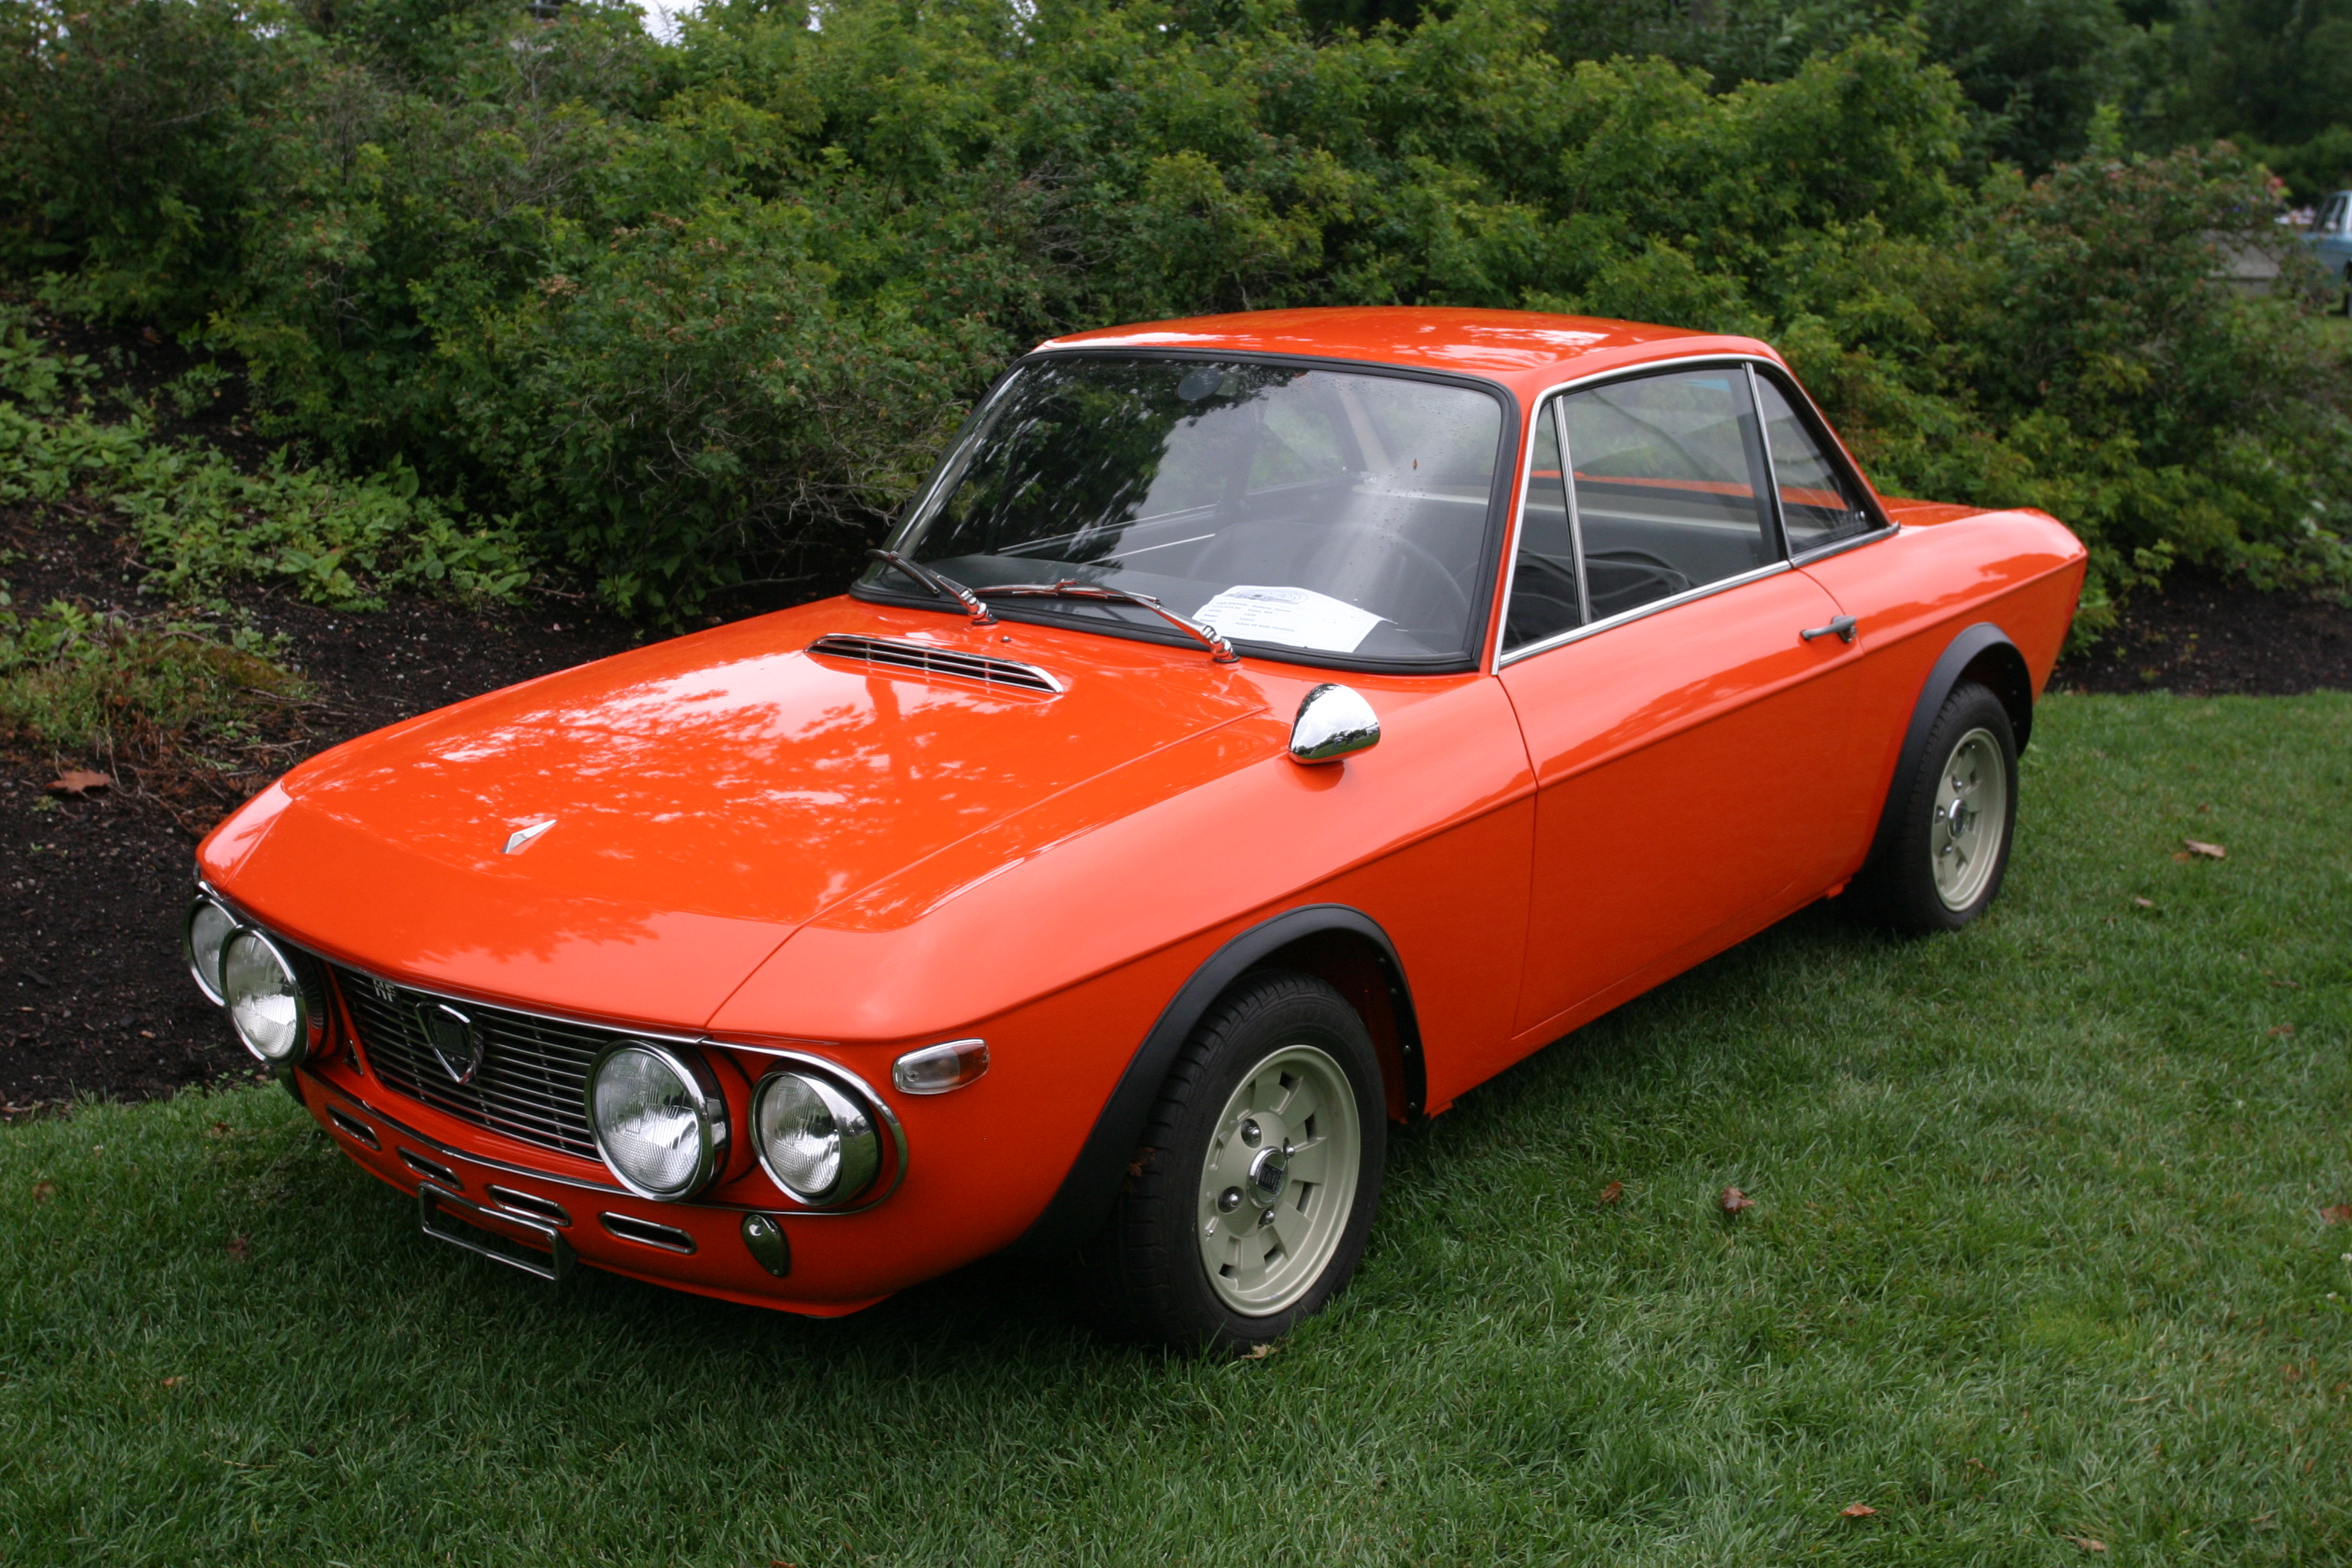 http://upload.wikimedia.org/wikipedia/commons/3/3e/Lancia_Fulvia_HF_Fanalone_1970_-_0.jpg?uselang=fr